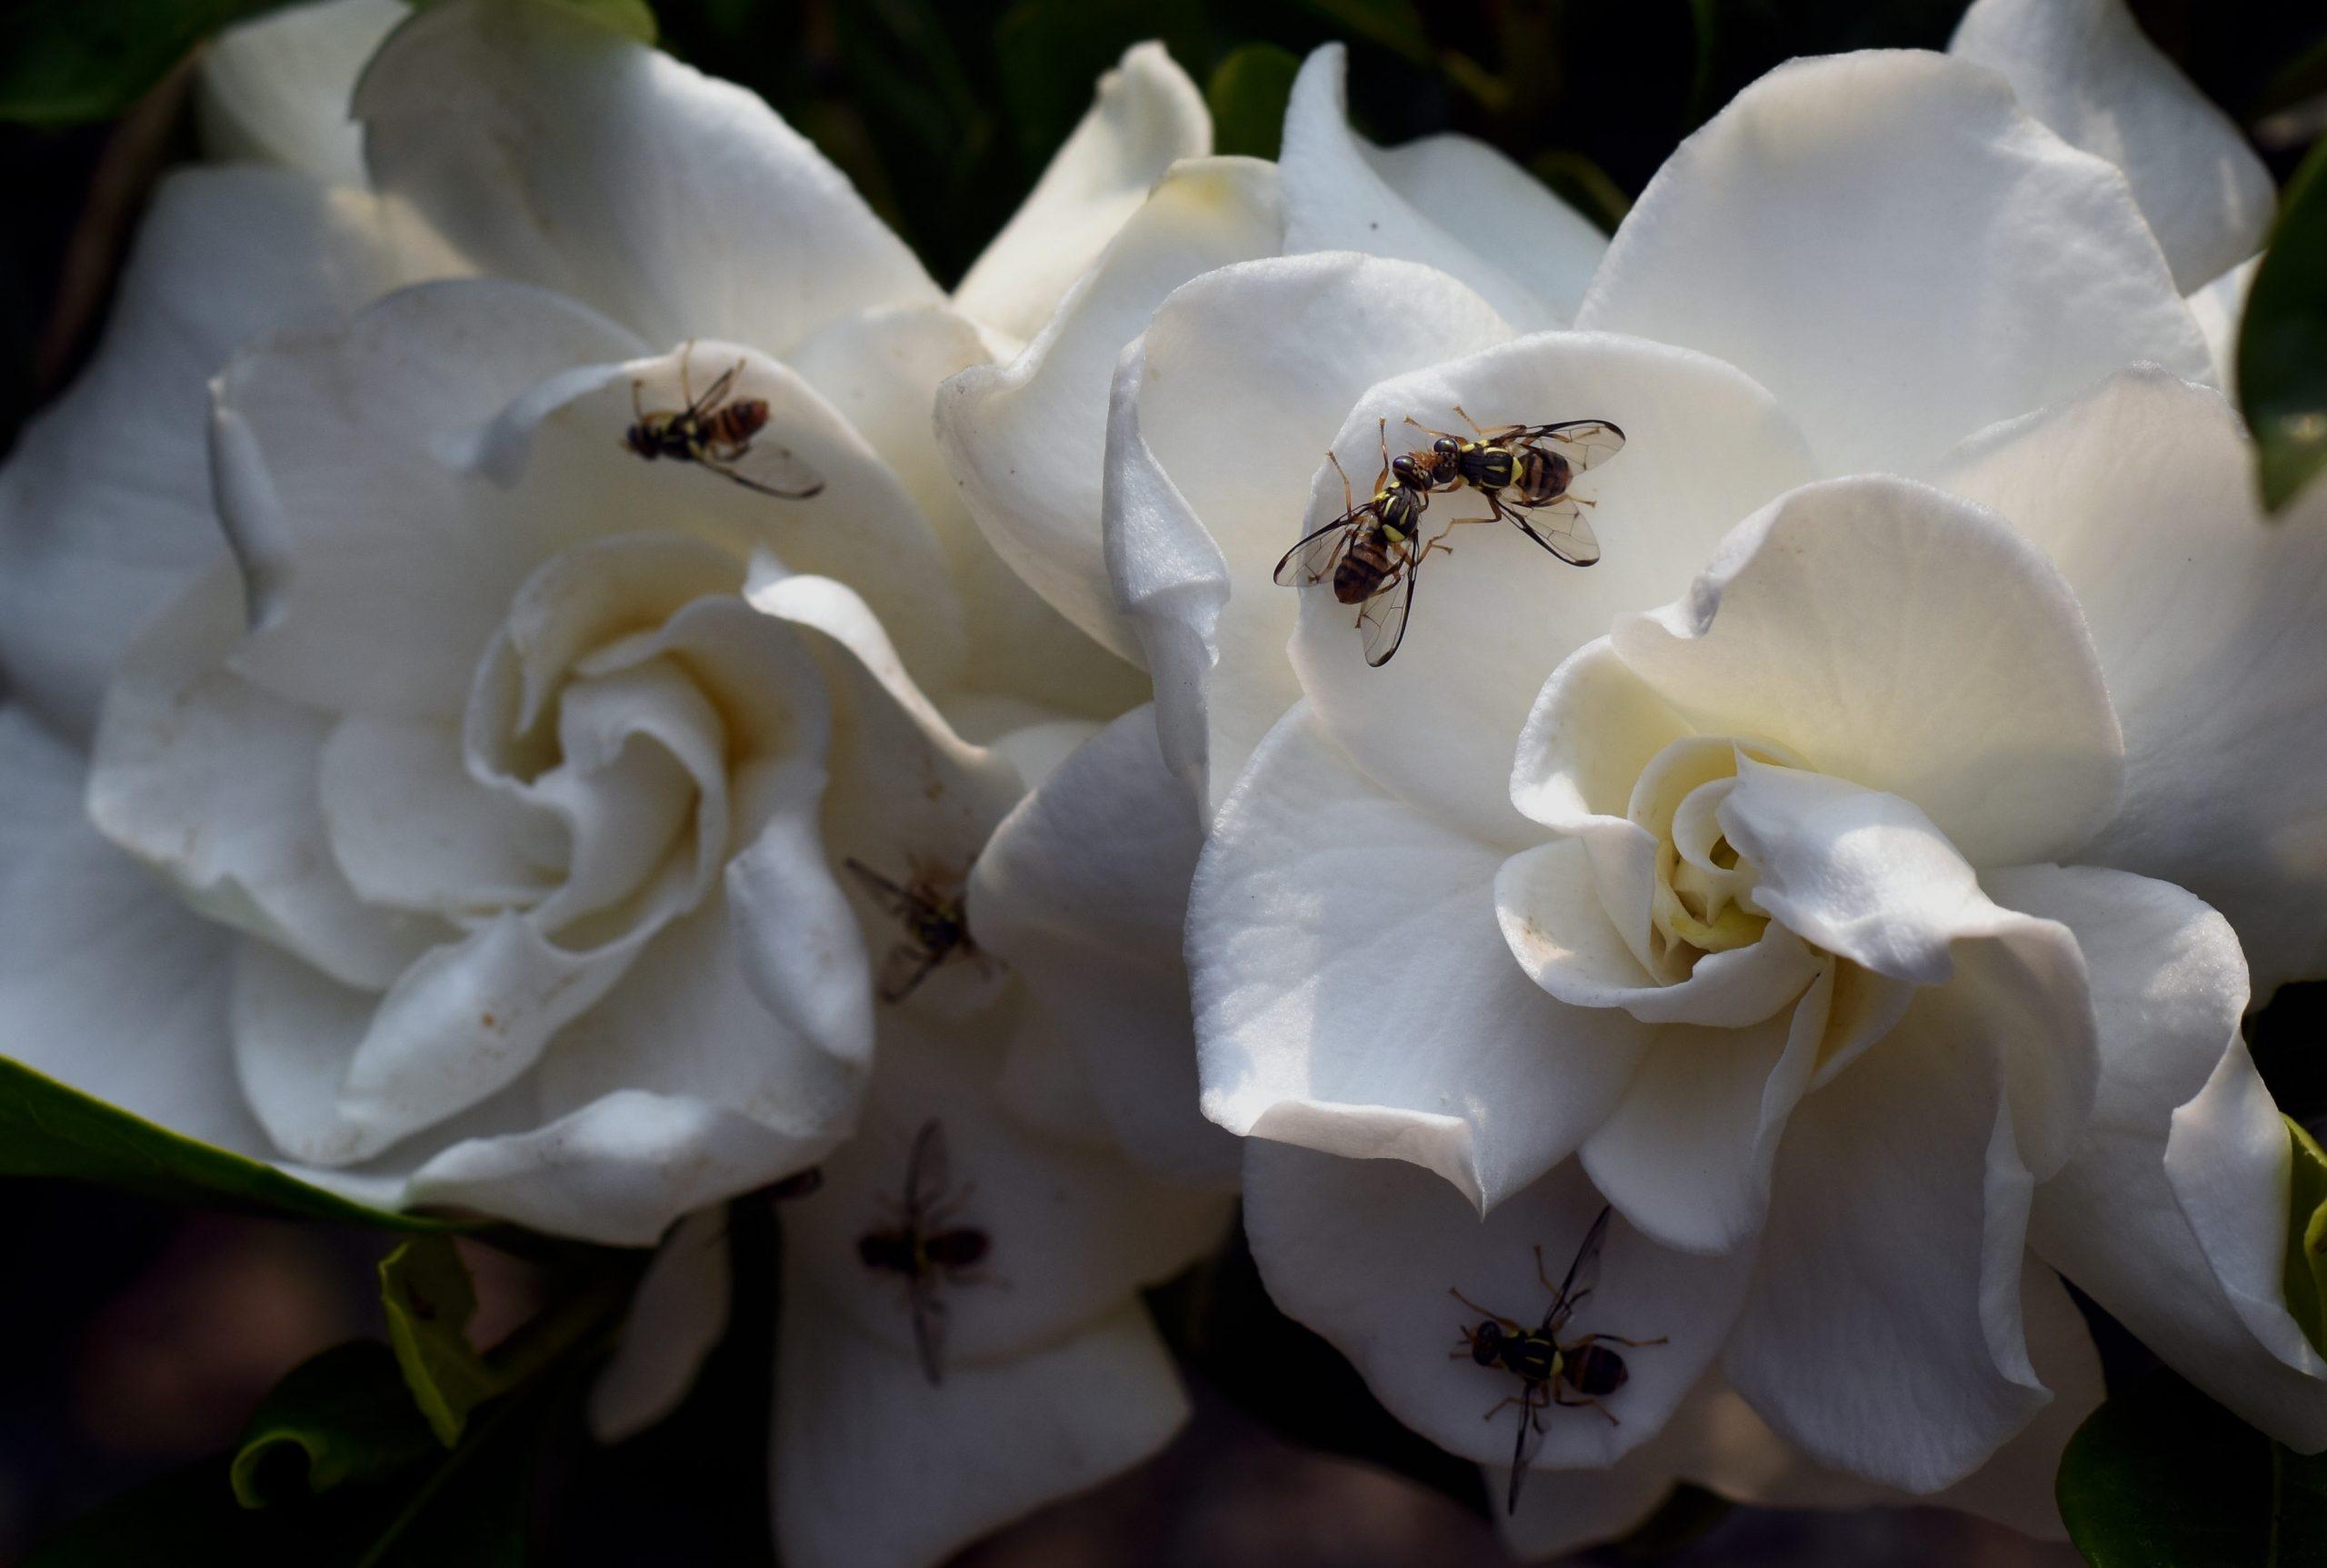 Flies on white flowers